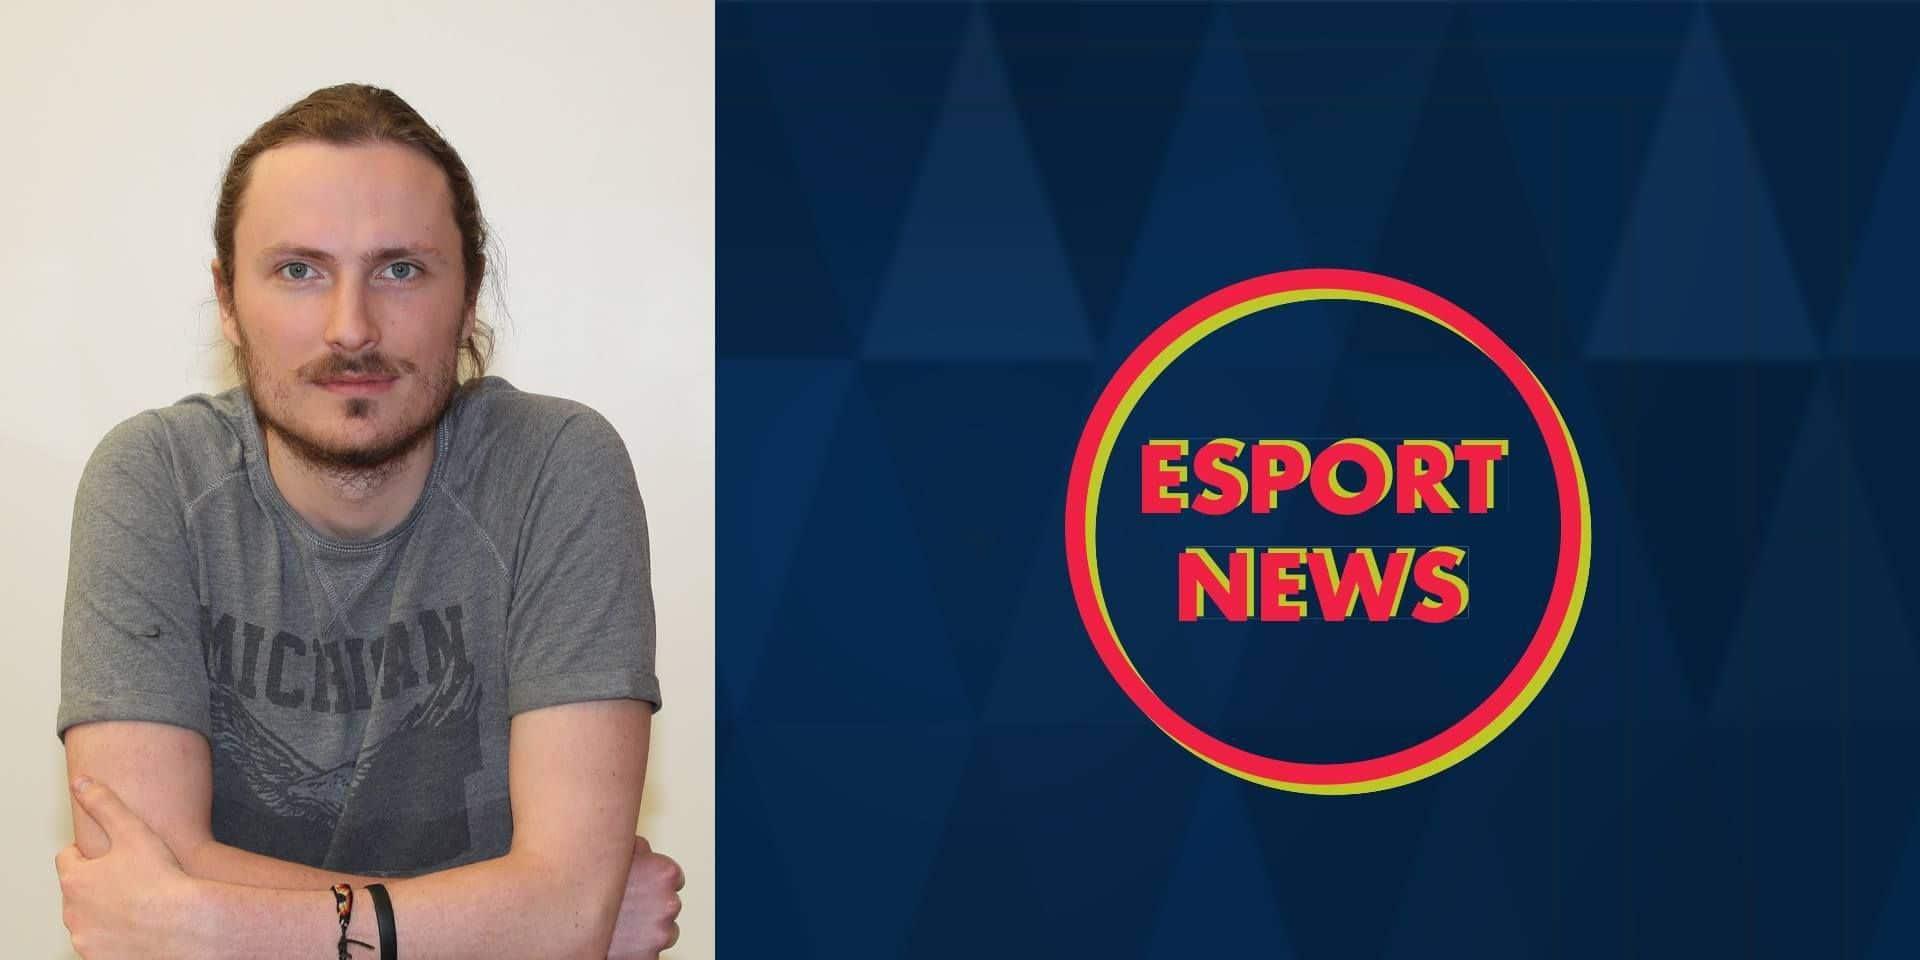 DH Esport News : toutes les news esportives de la semaine ! (VIDÉO)